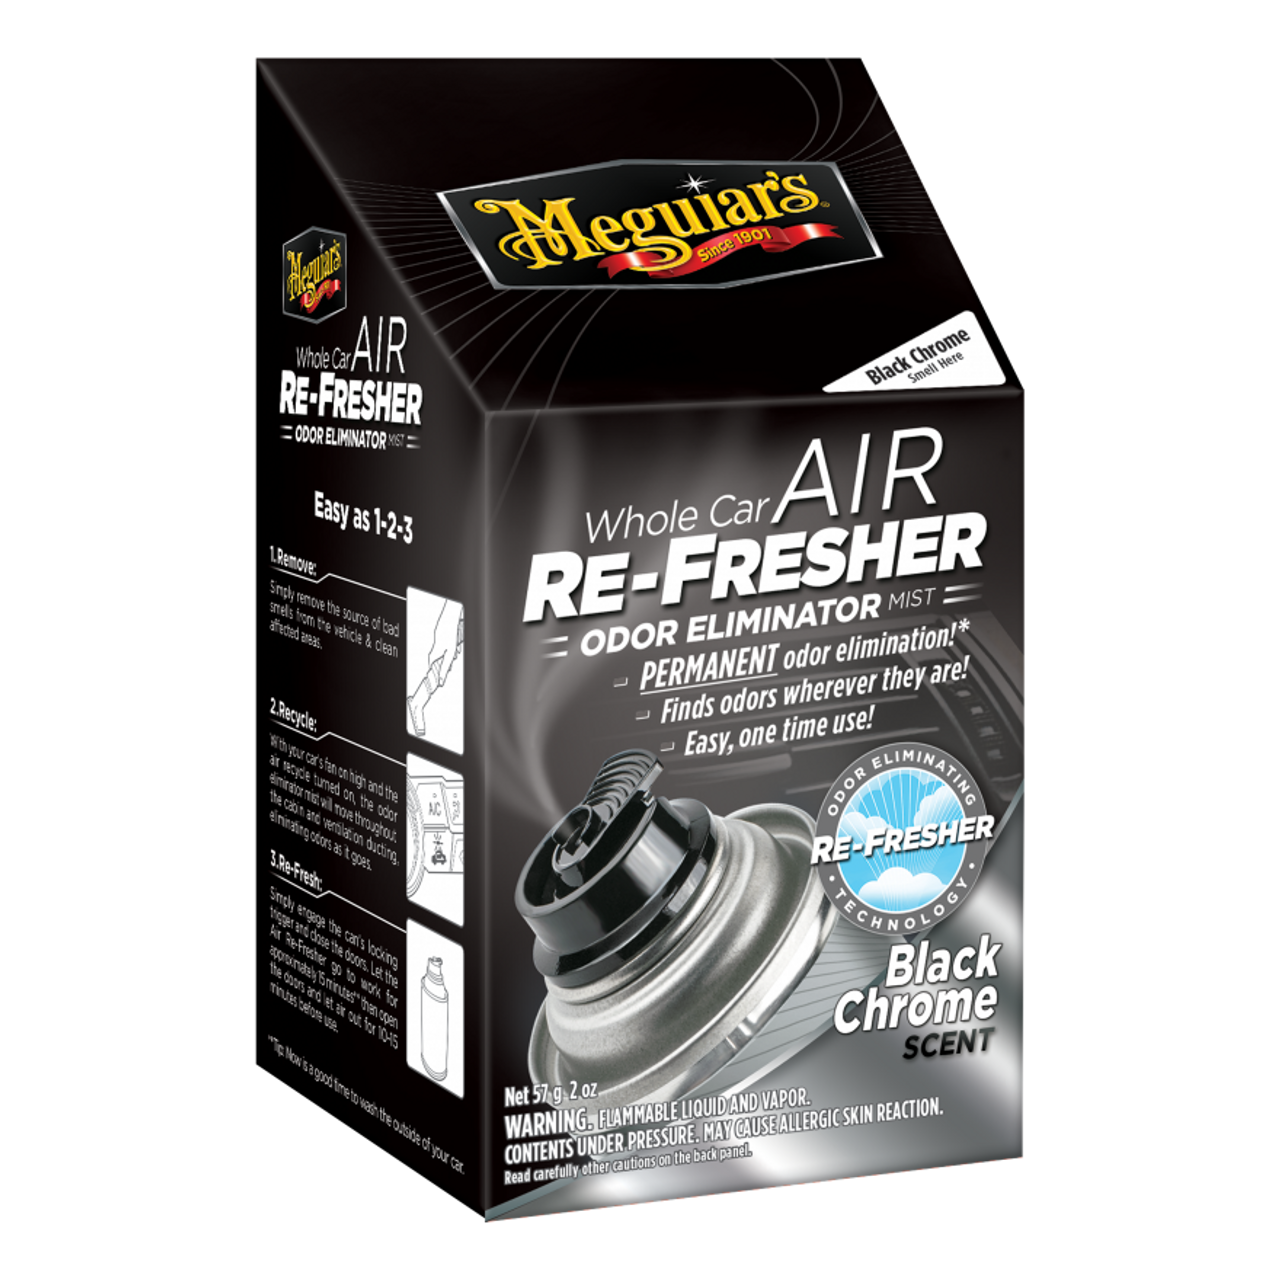 Car Odor Eliminator >> Meguiar S Whole Car Air Refresher Odor Eliminator Black Chrome